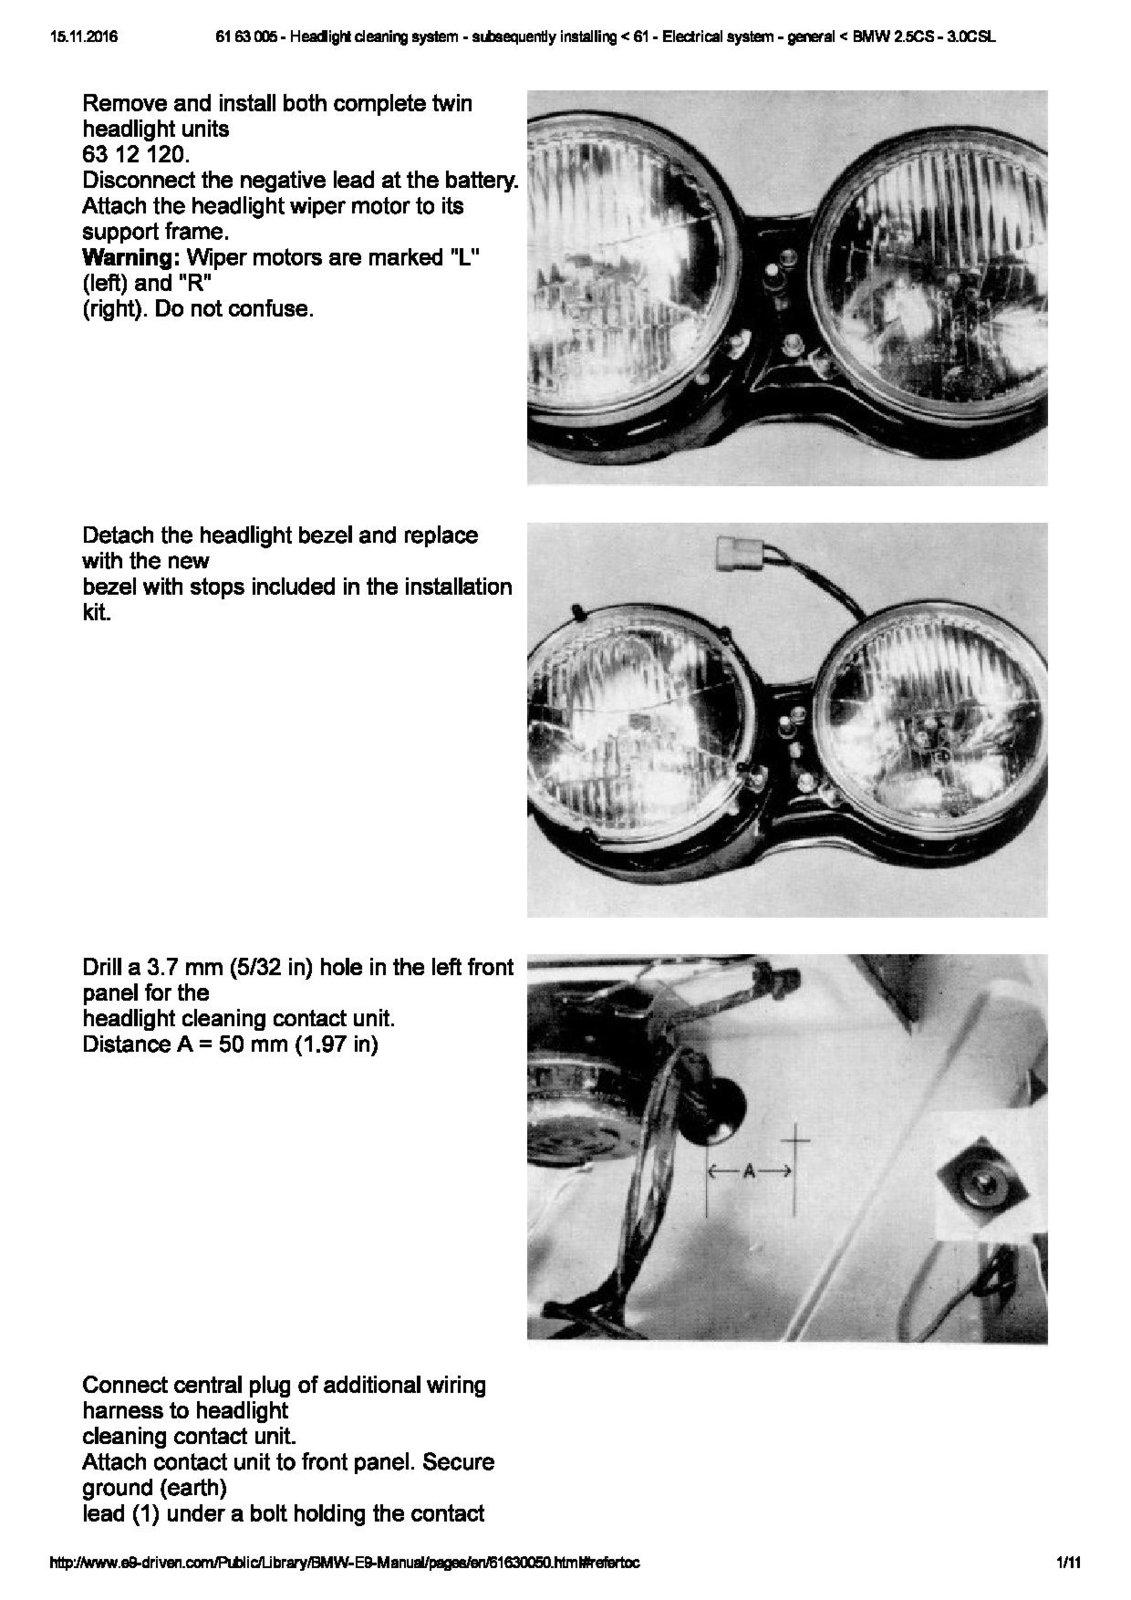 321-page-001.jpg